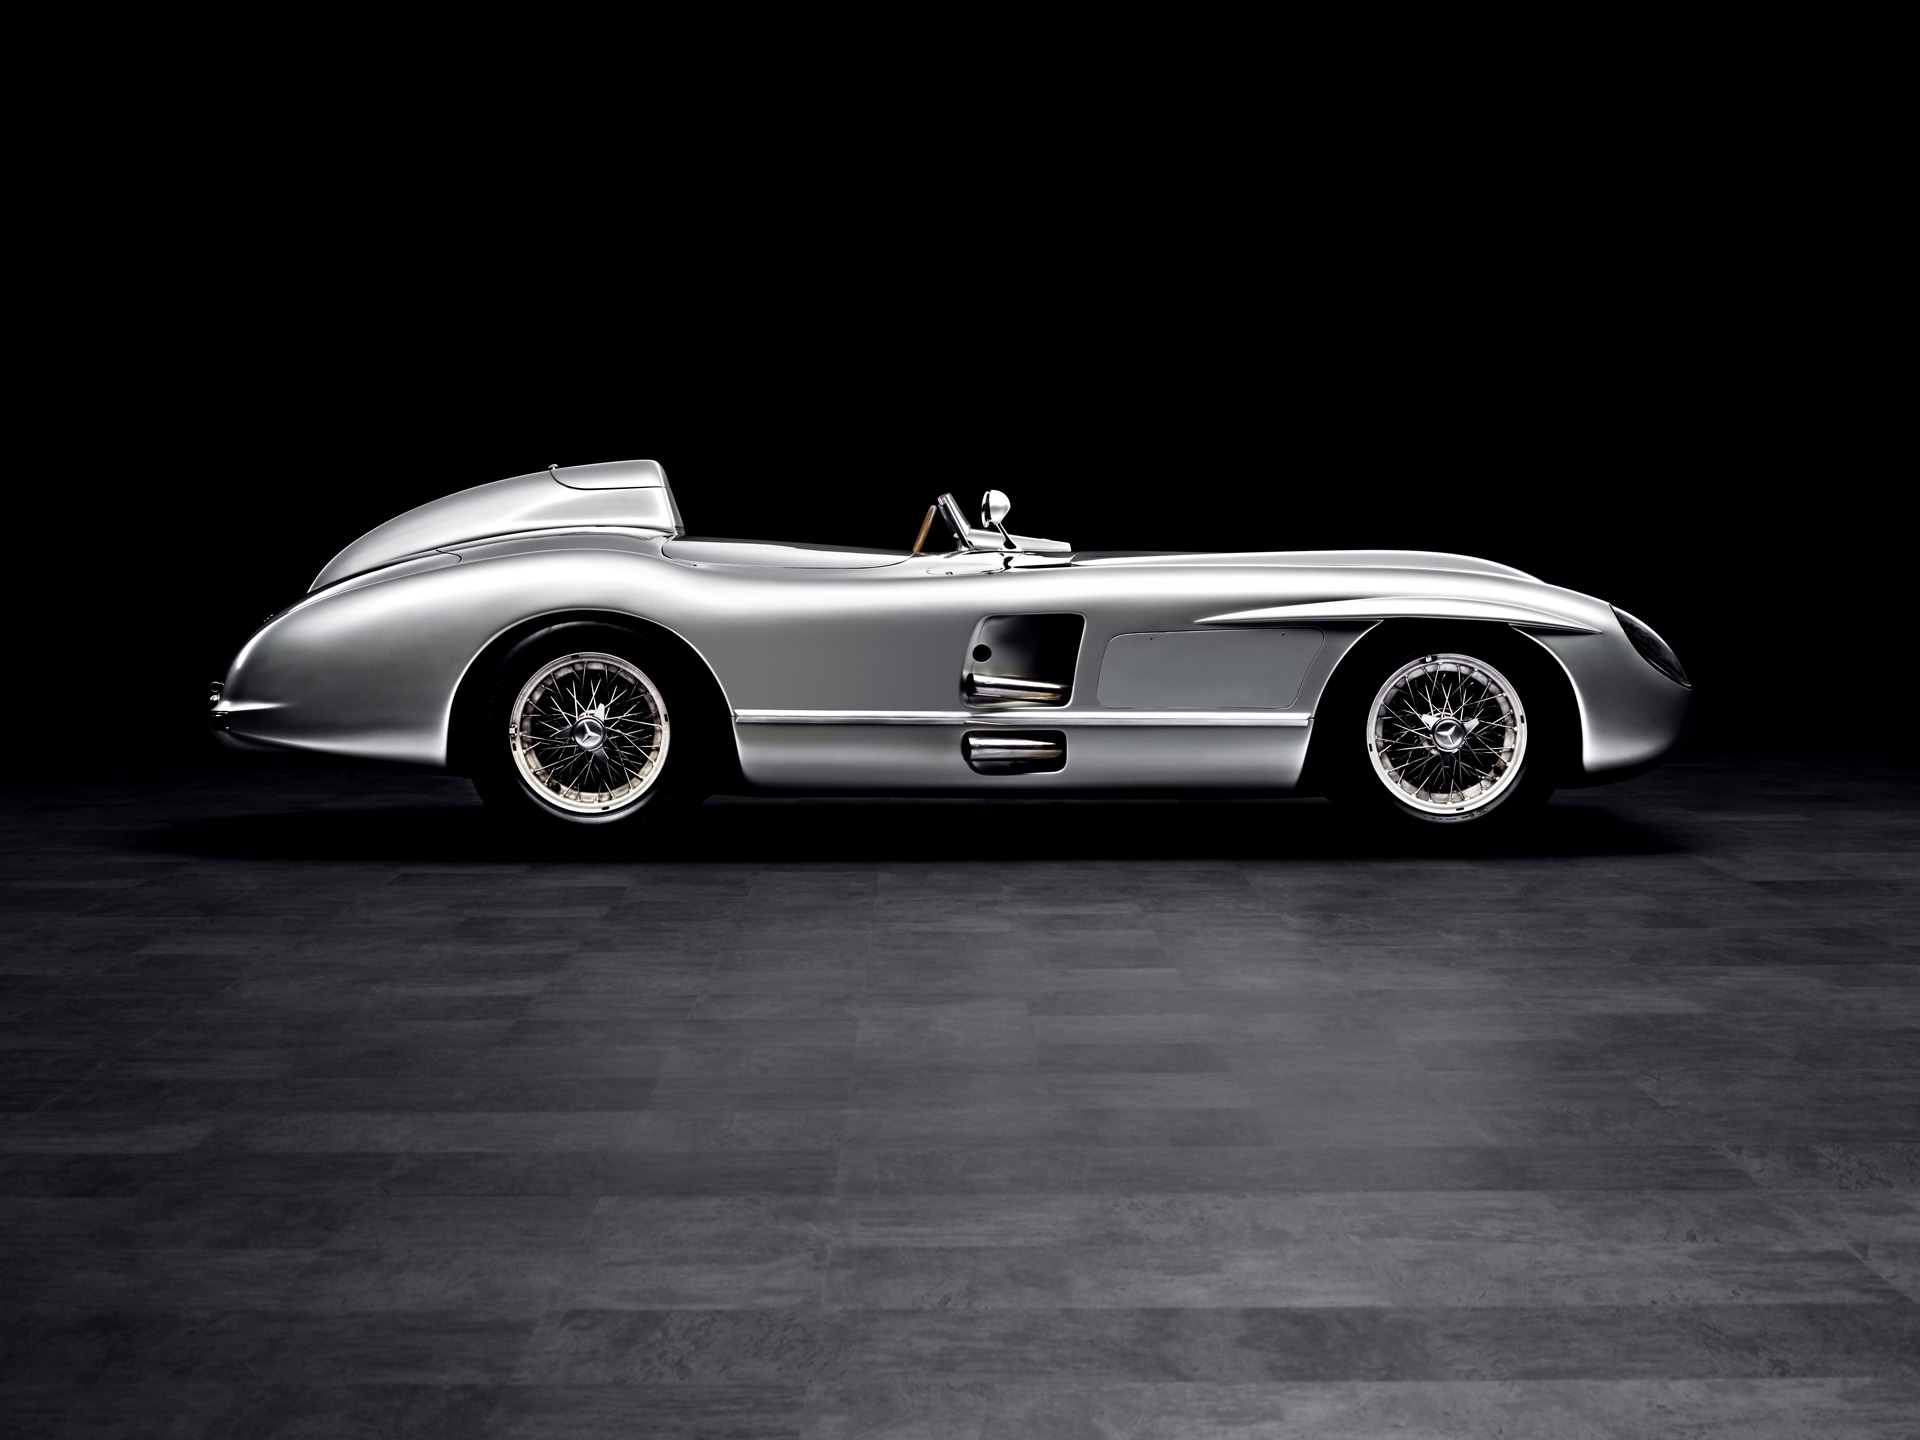 Mercedes benz 300 slr silodrome for 1955 mercedes benz